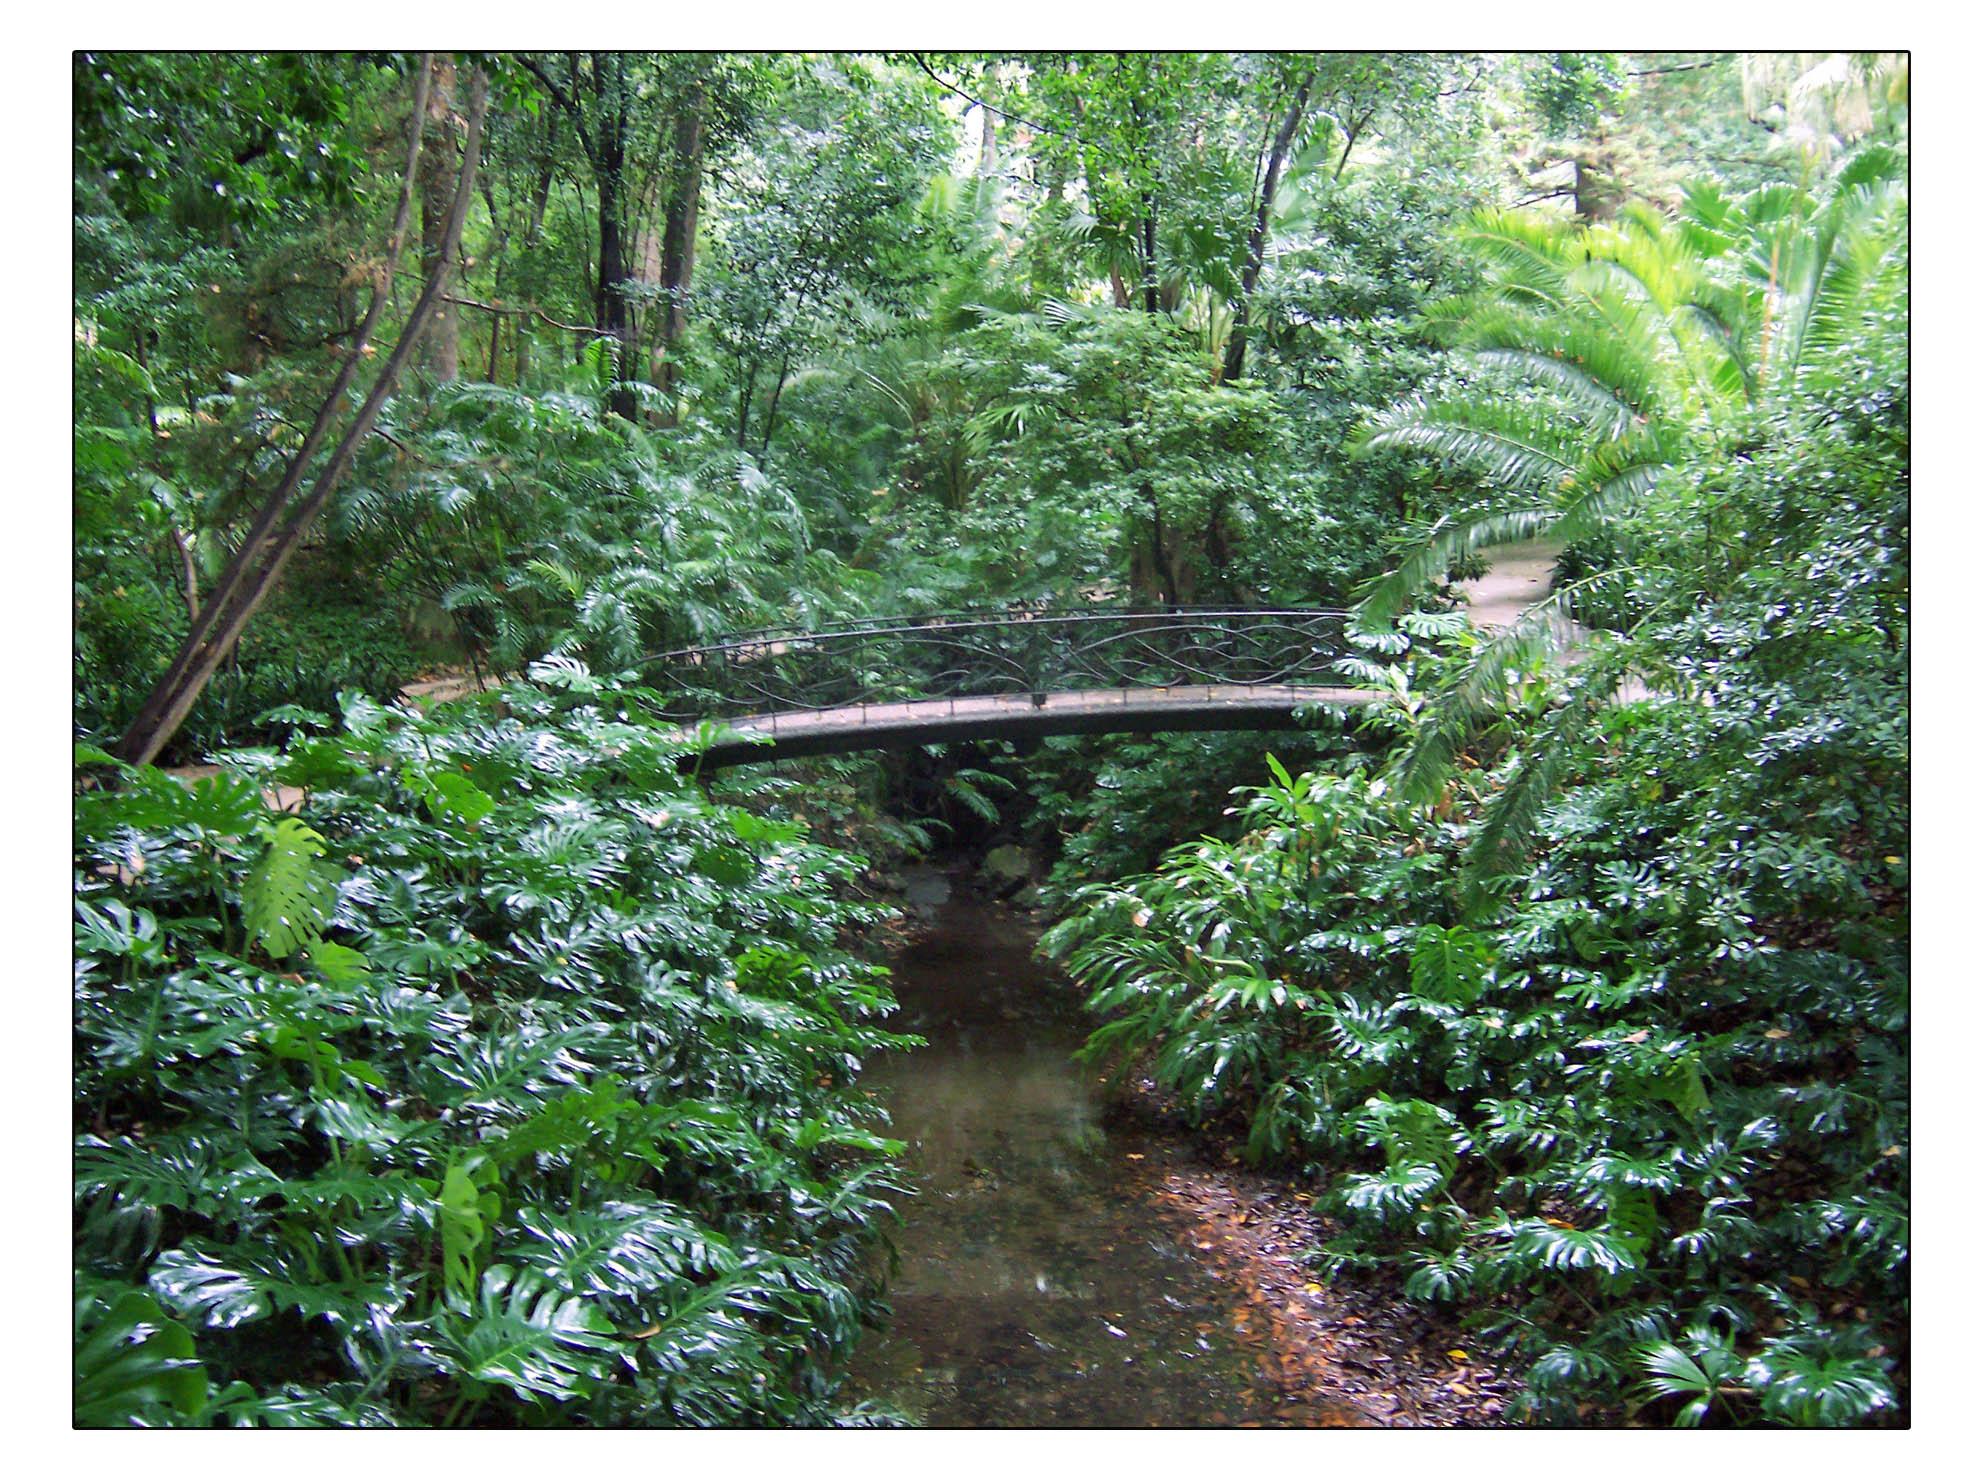 Planes minimal jard n bot nico hist rico la concepci n de for Jardin botanico de malaga